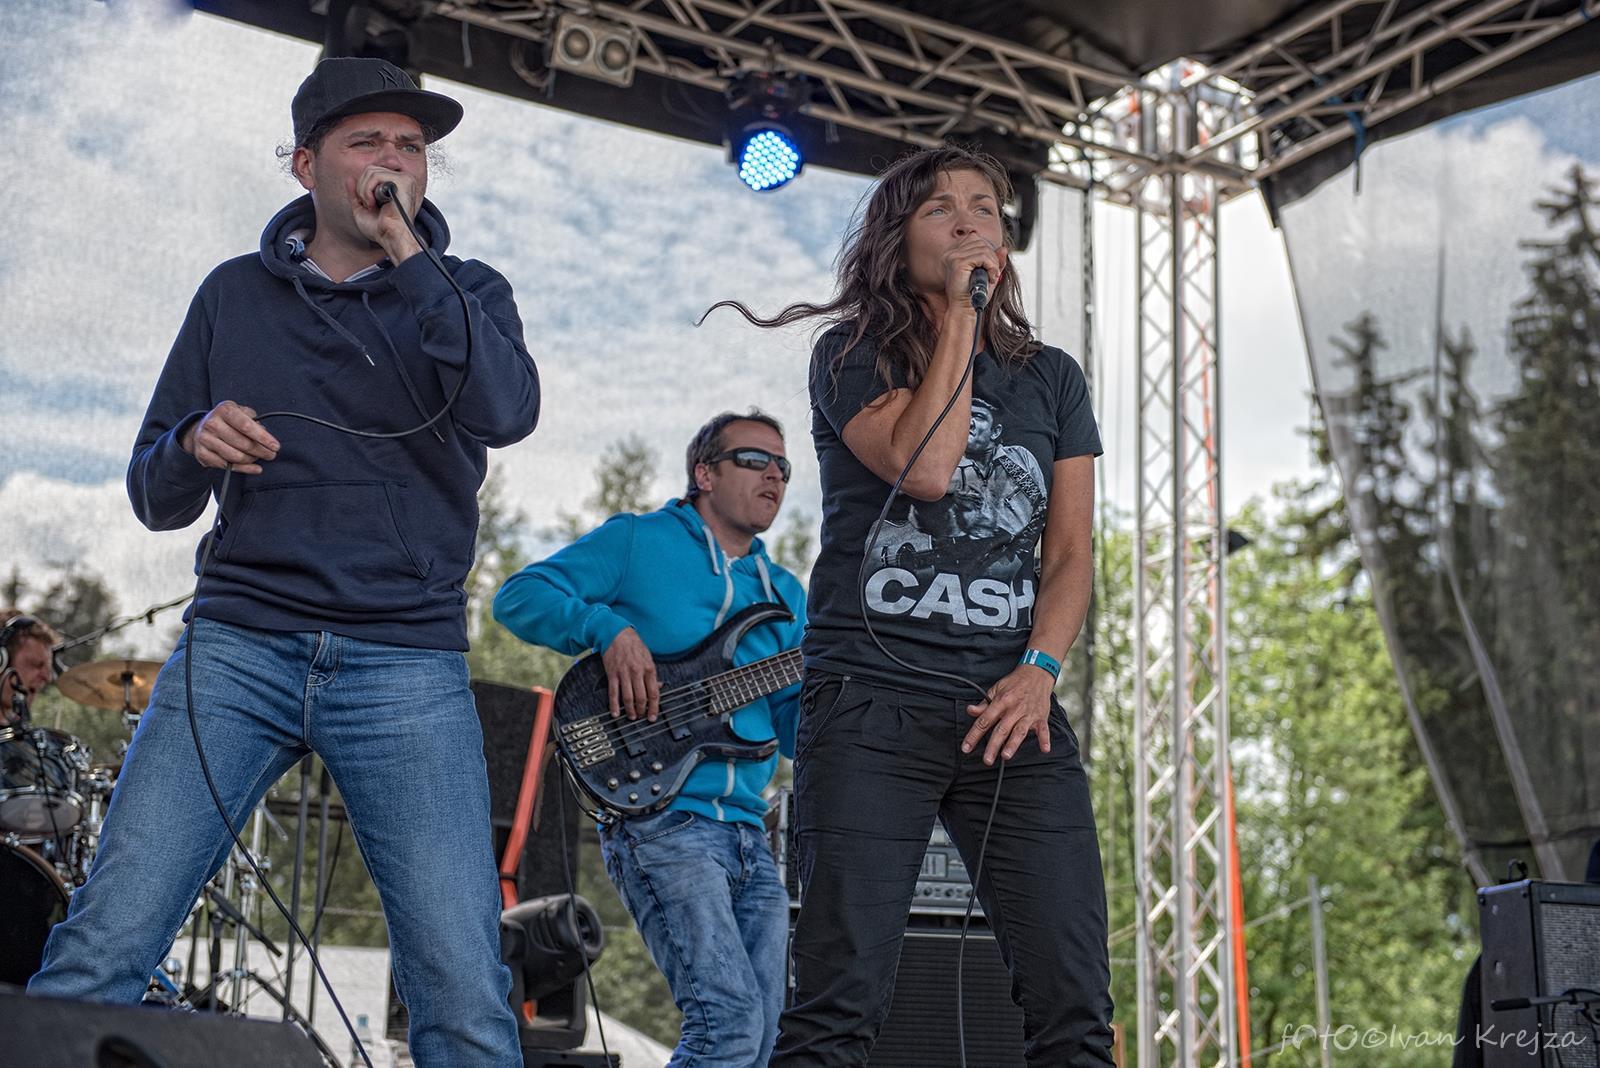 2015-06-20 - Hrebecsky Slunovrat 2015 - 17 (Gang Ala Basta) - Andrea Plíšková, Jan Somolík, Lukáš Máchal